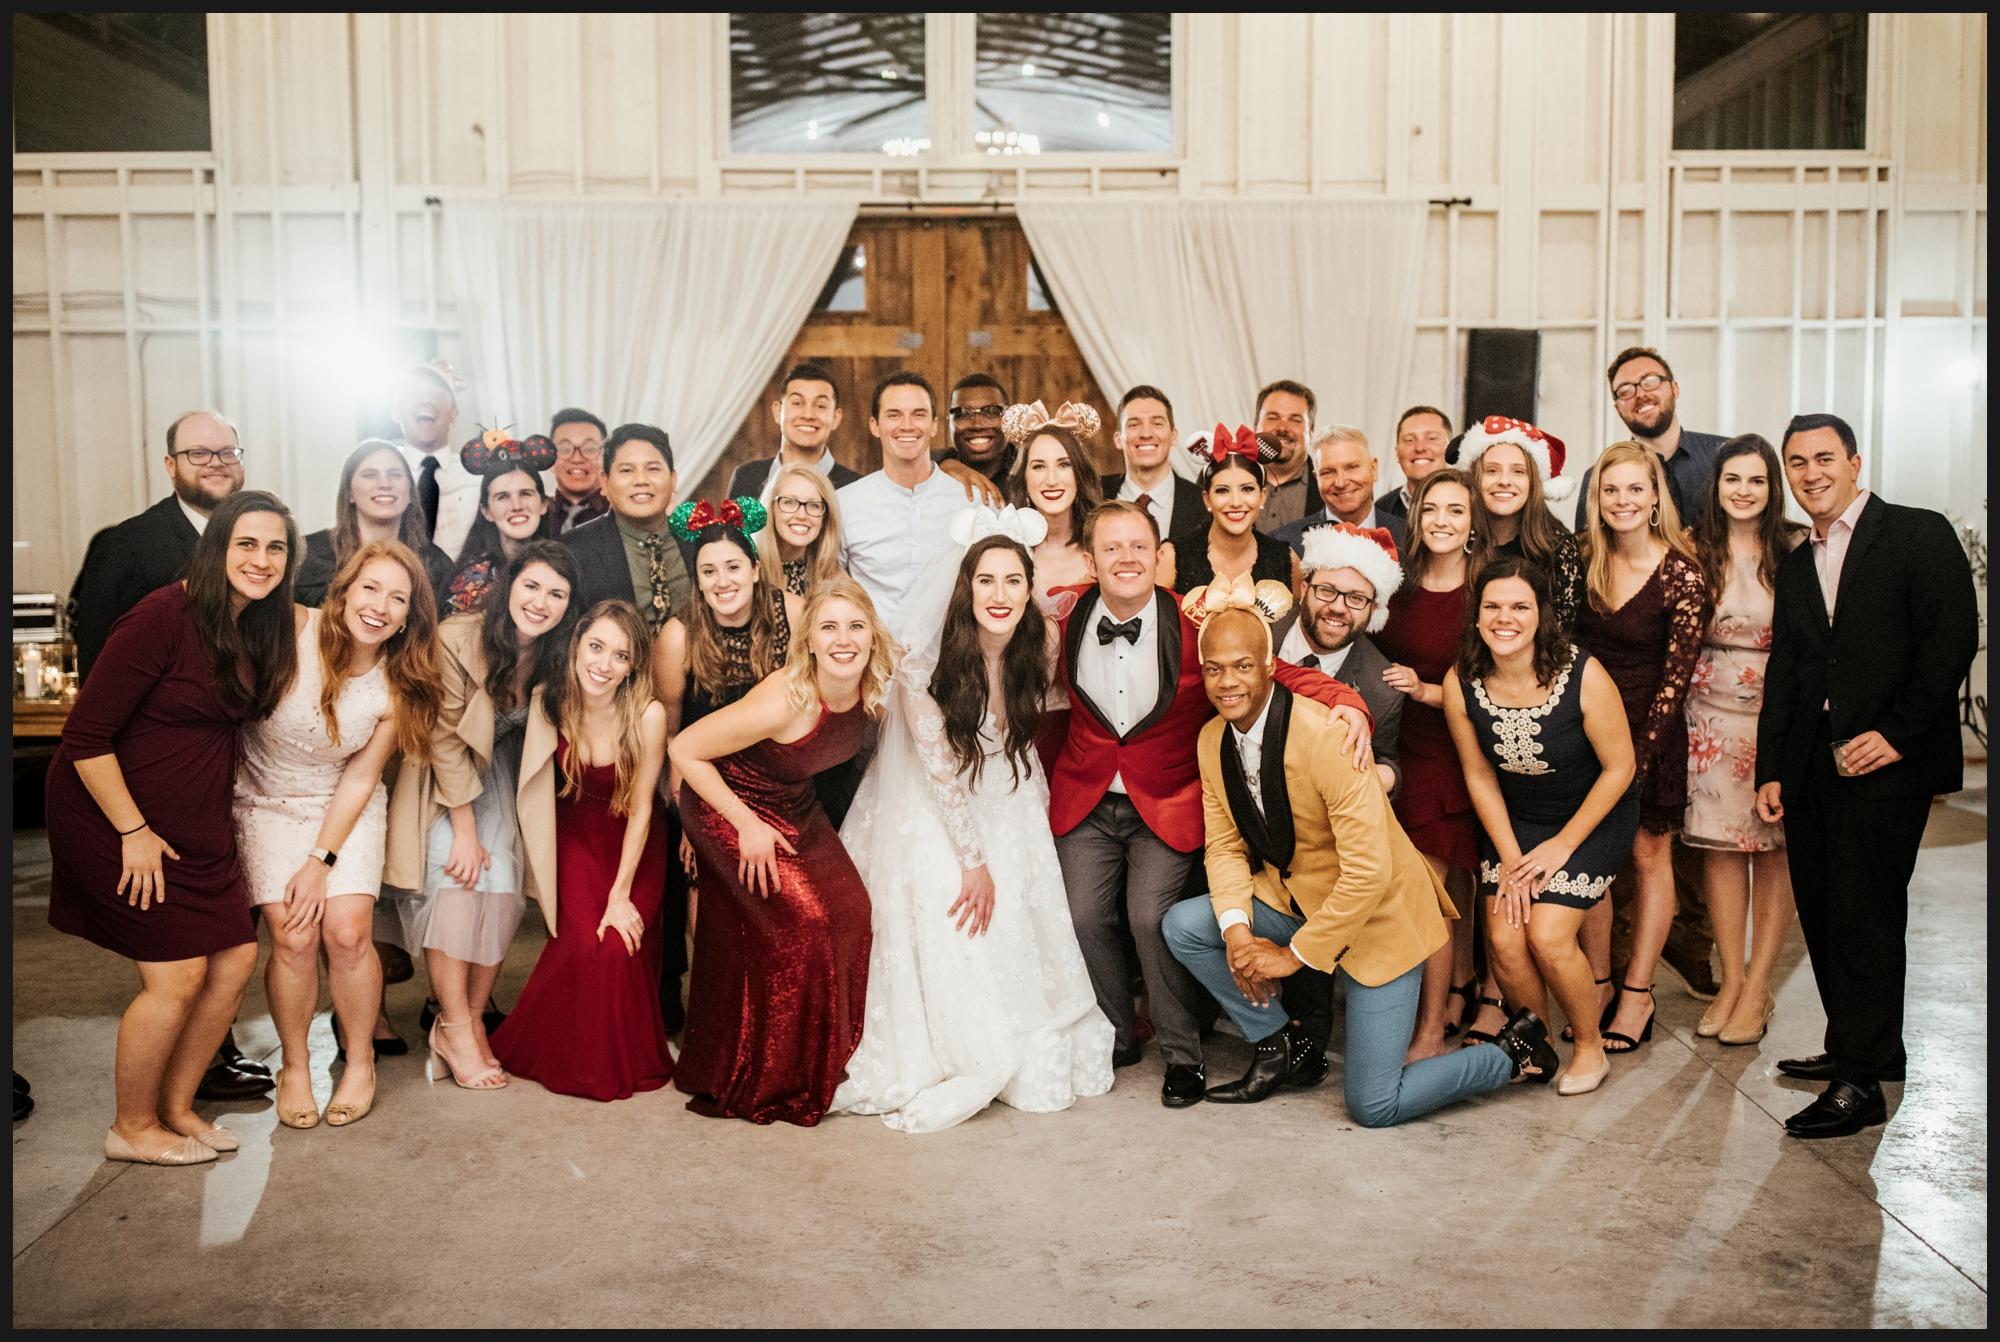 Orlando-Wedding-Photographer-destination-wedding-photographer-florida-wedding-photographer-hawaii-wedding-photographer_0540.jpg